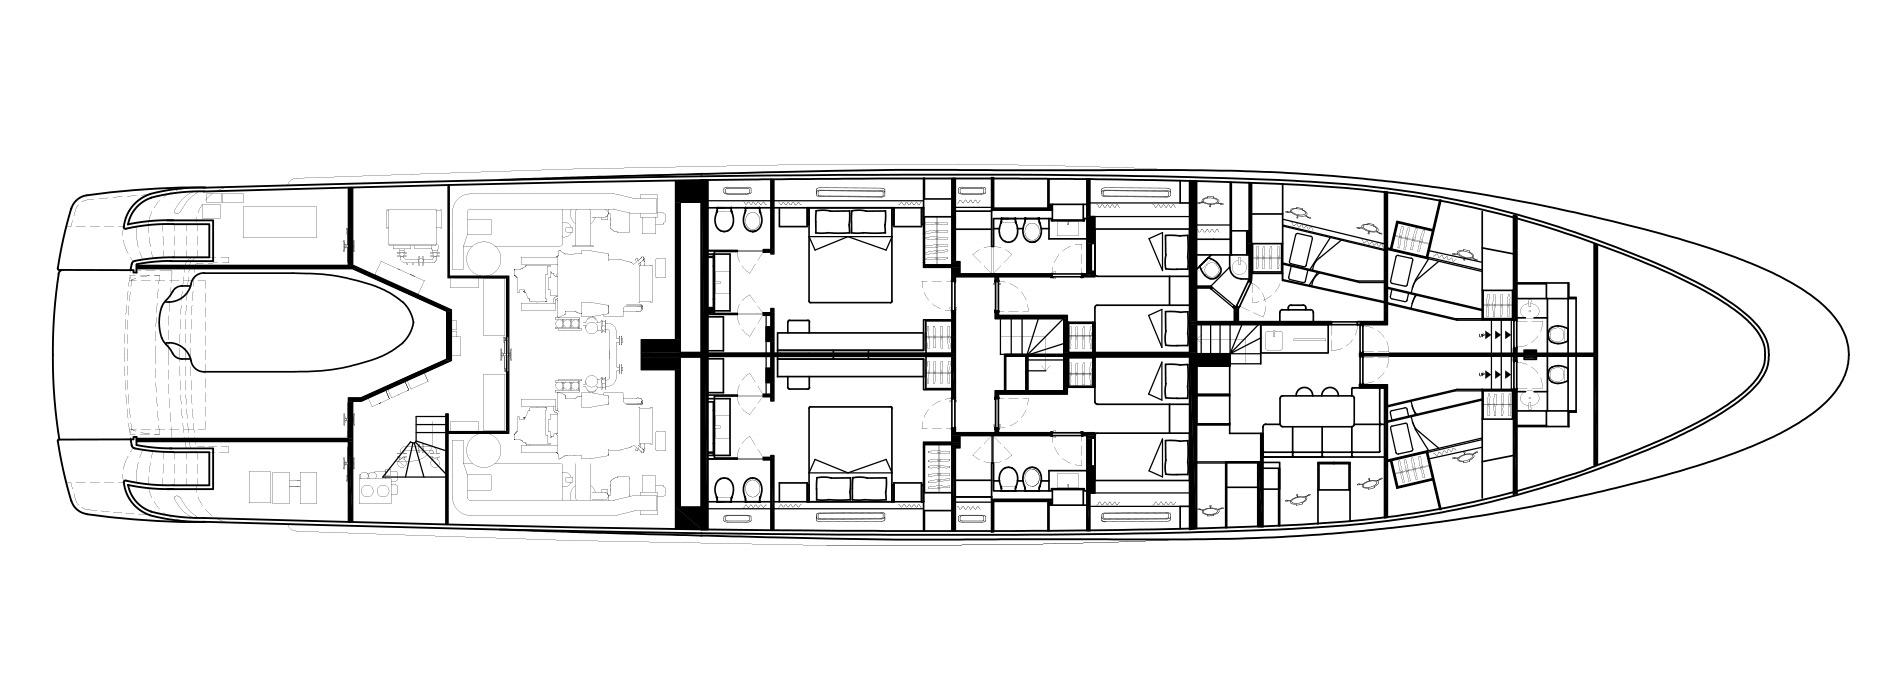 Sanlorenzo Yachts SD126 Нижняя палуба версия A